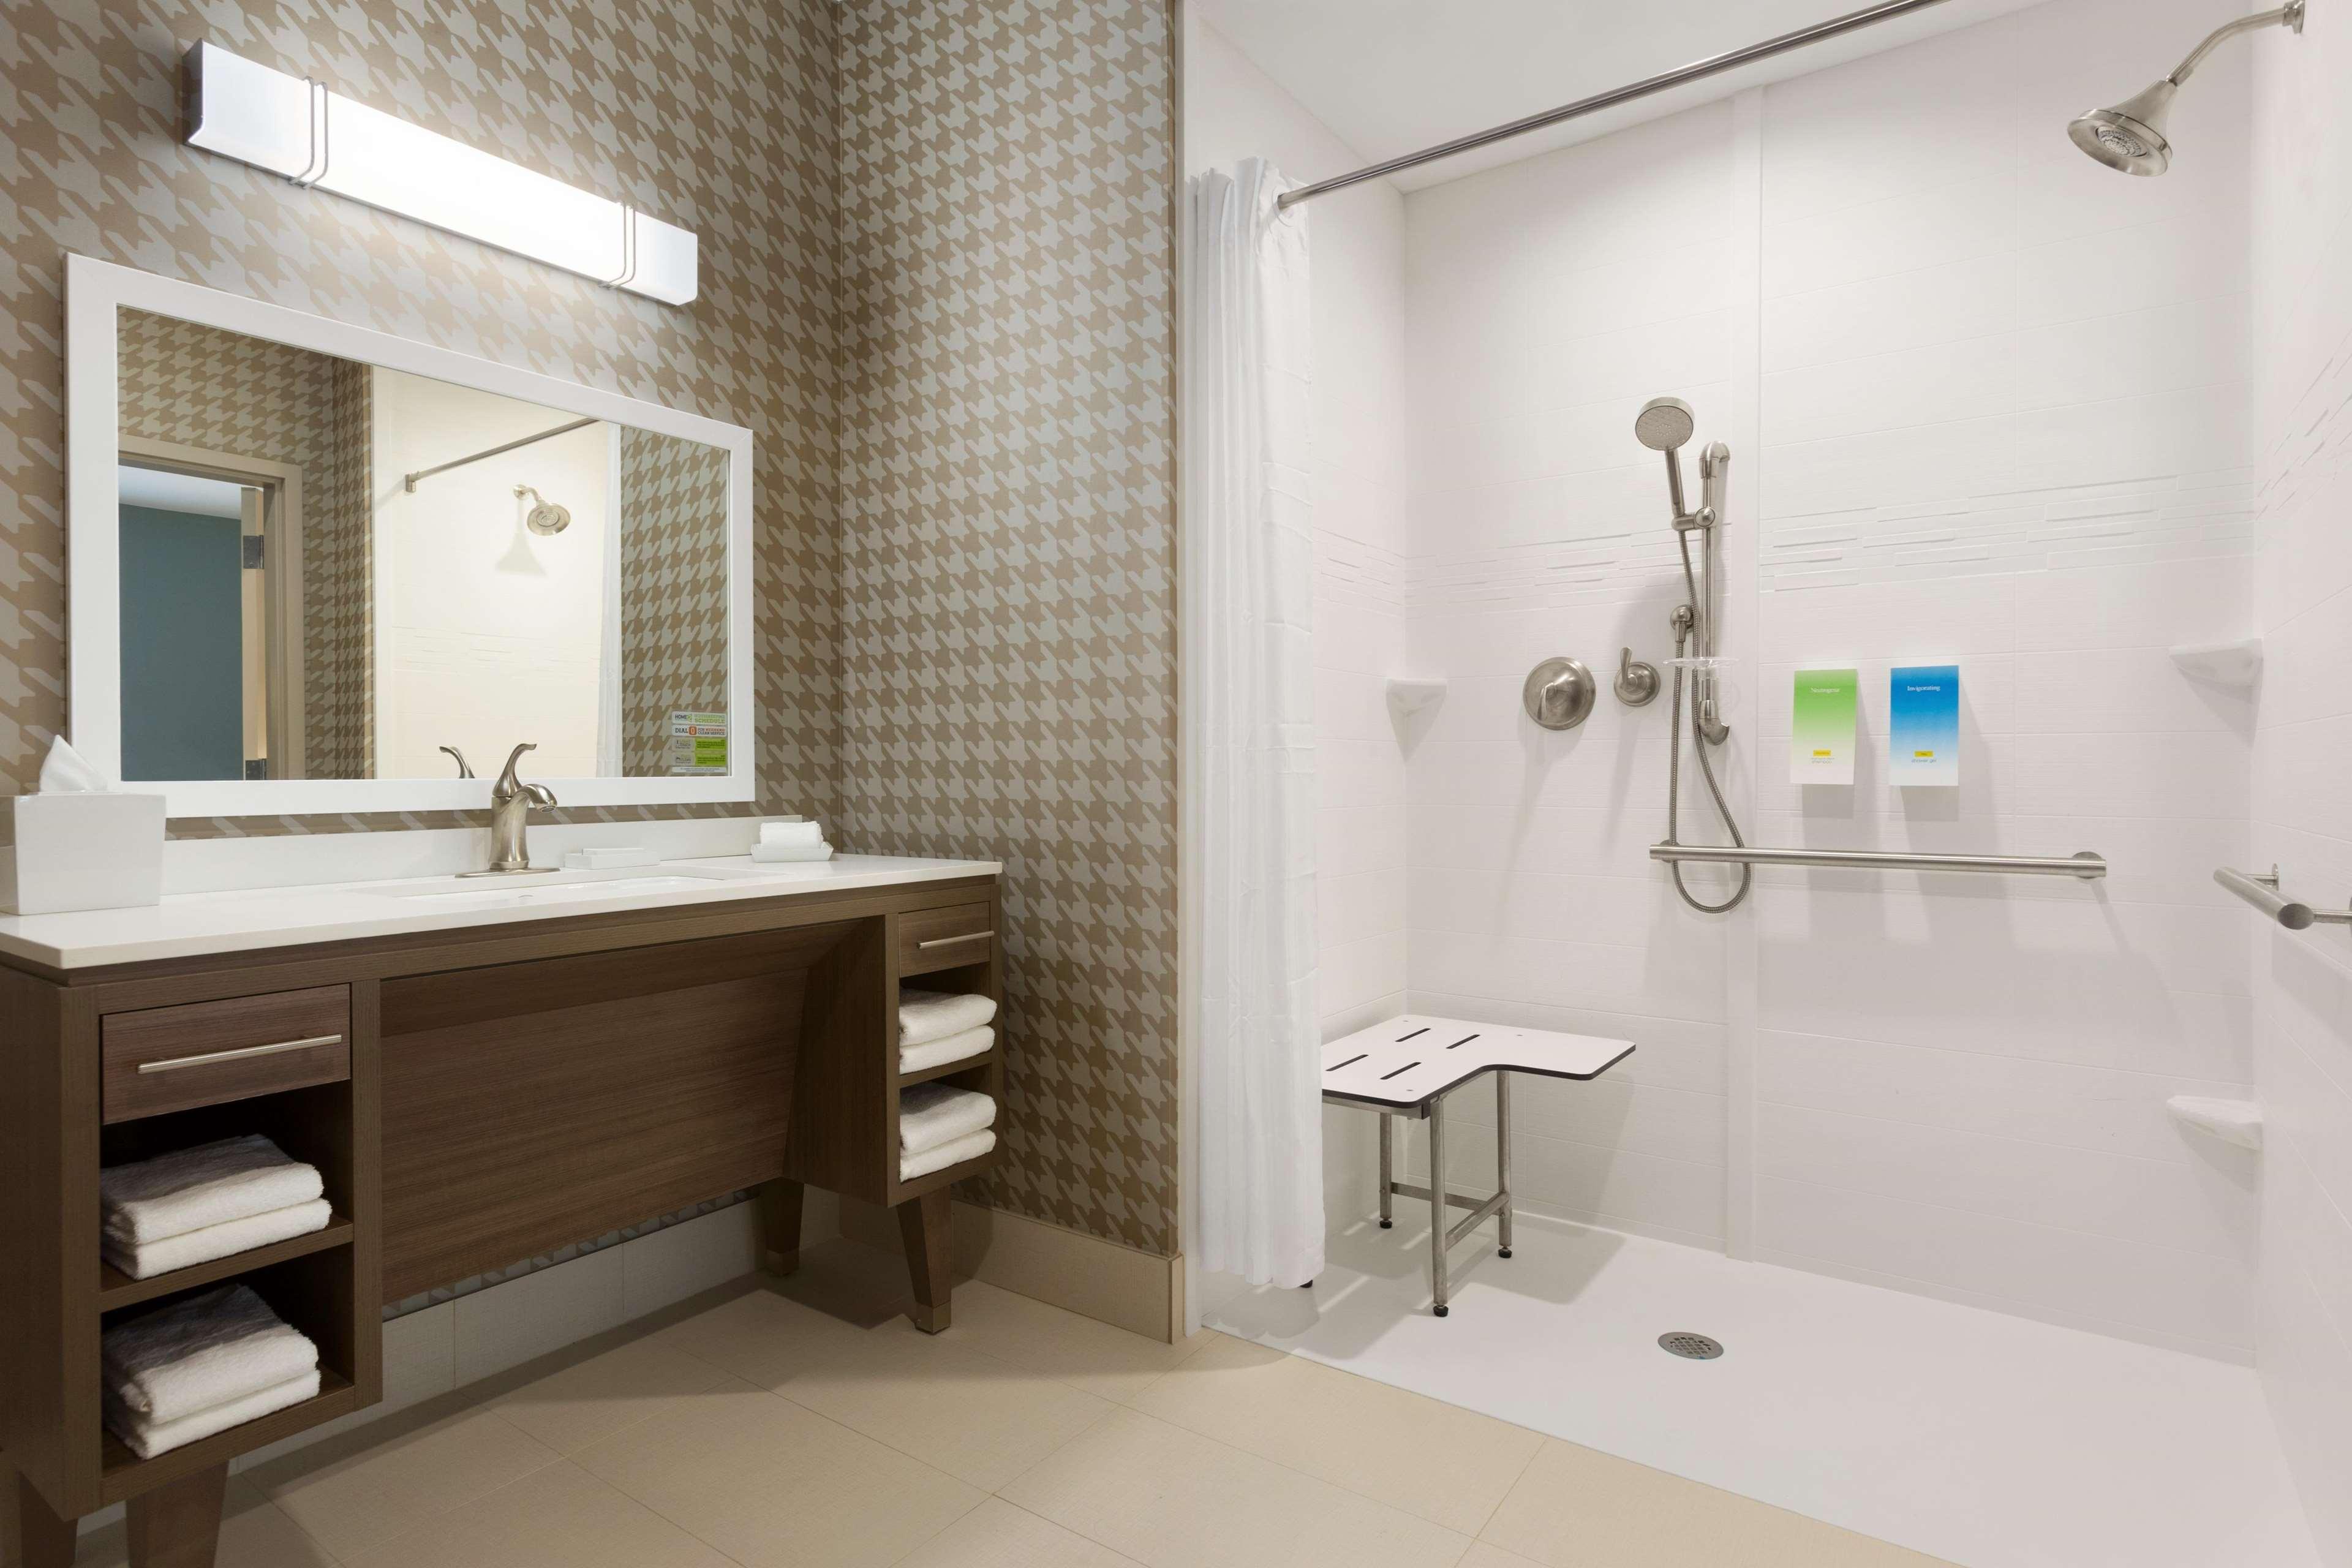 Home2 Suites by Hilton Florence Cincinnati Airport South image 21